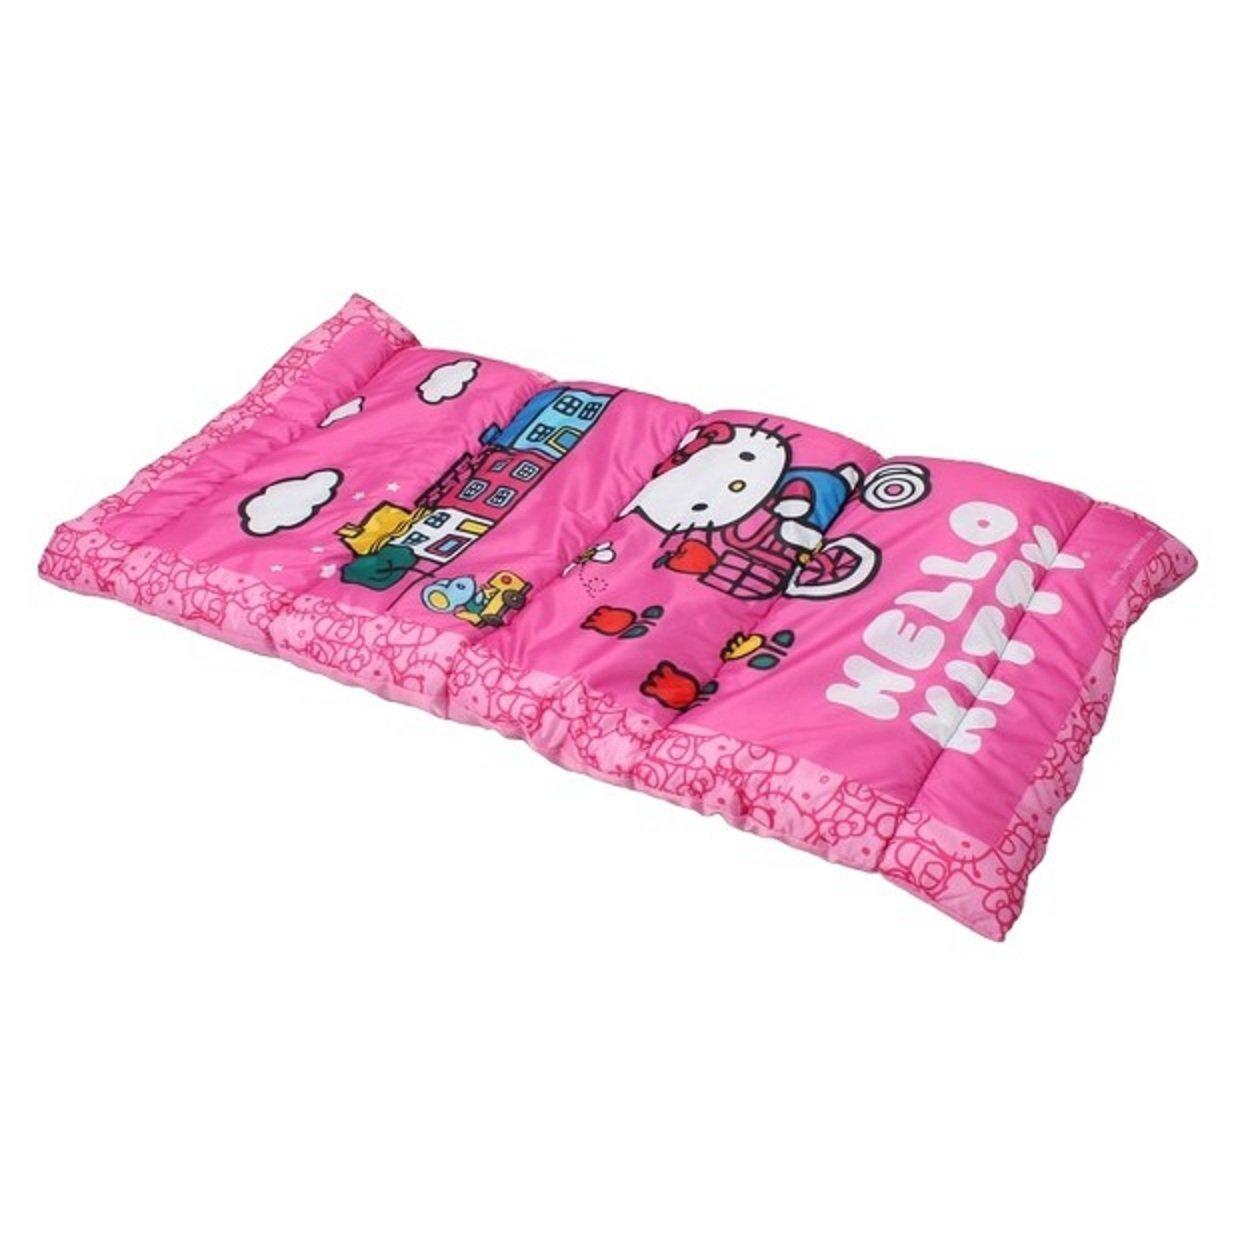 Disney Hello Kitty Kid's Sleeping Bag